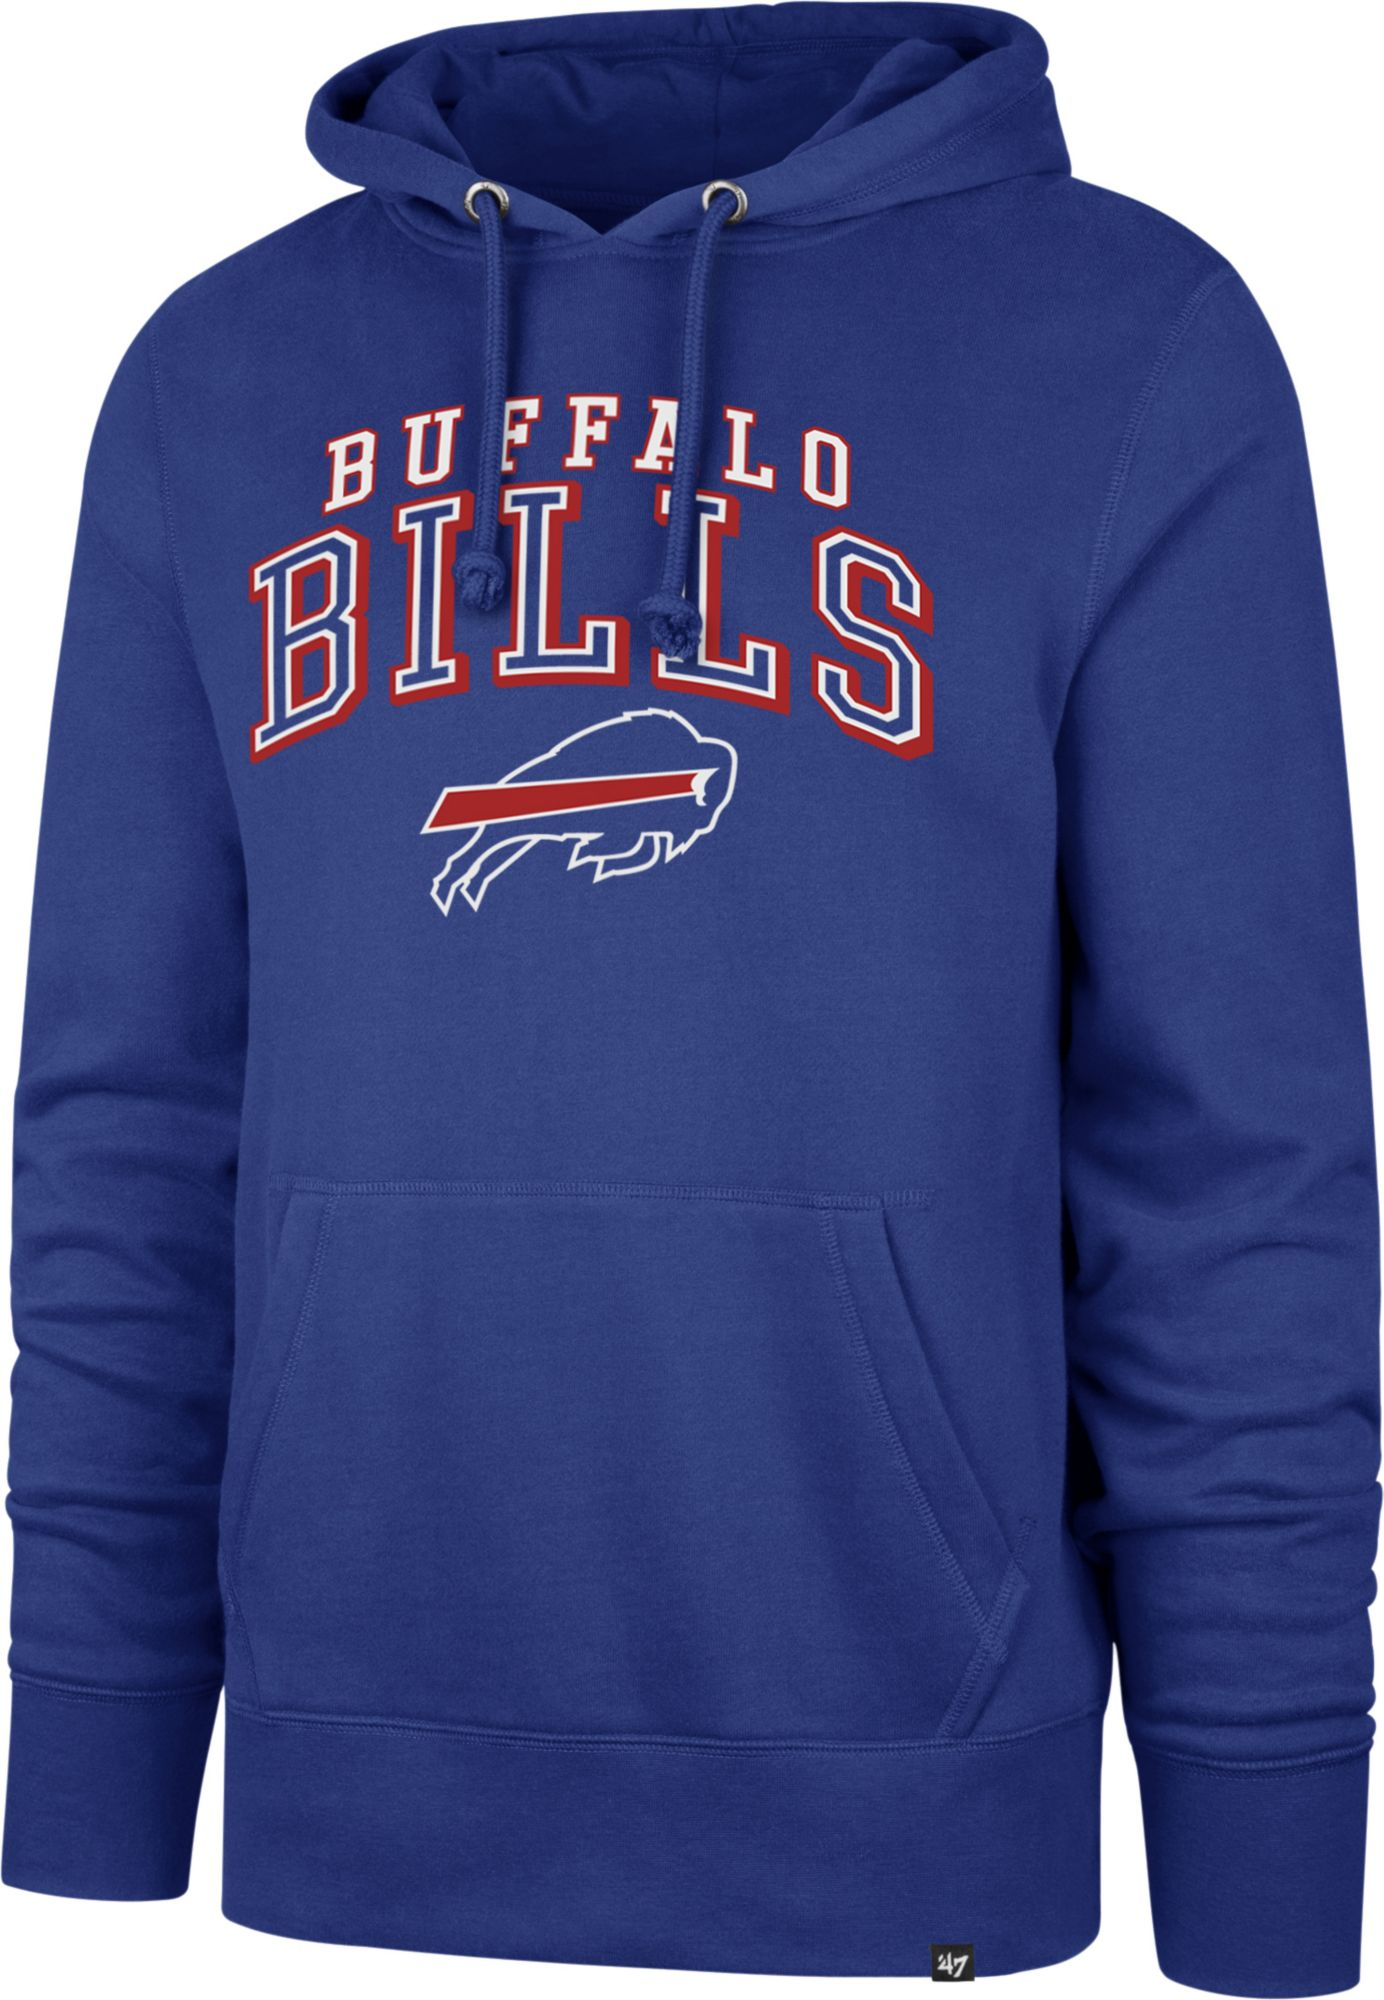 Buffalo Bills Headline Royal Hoodie